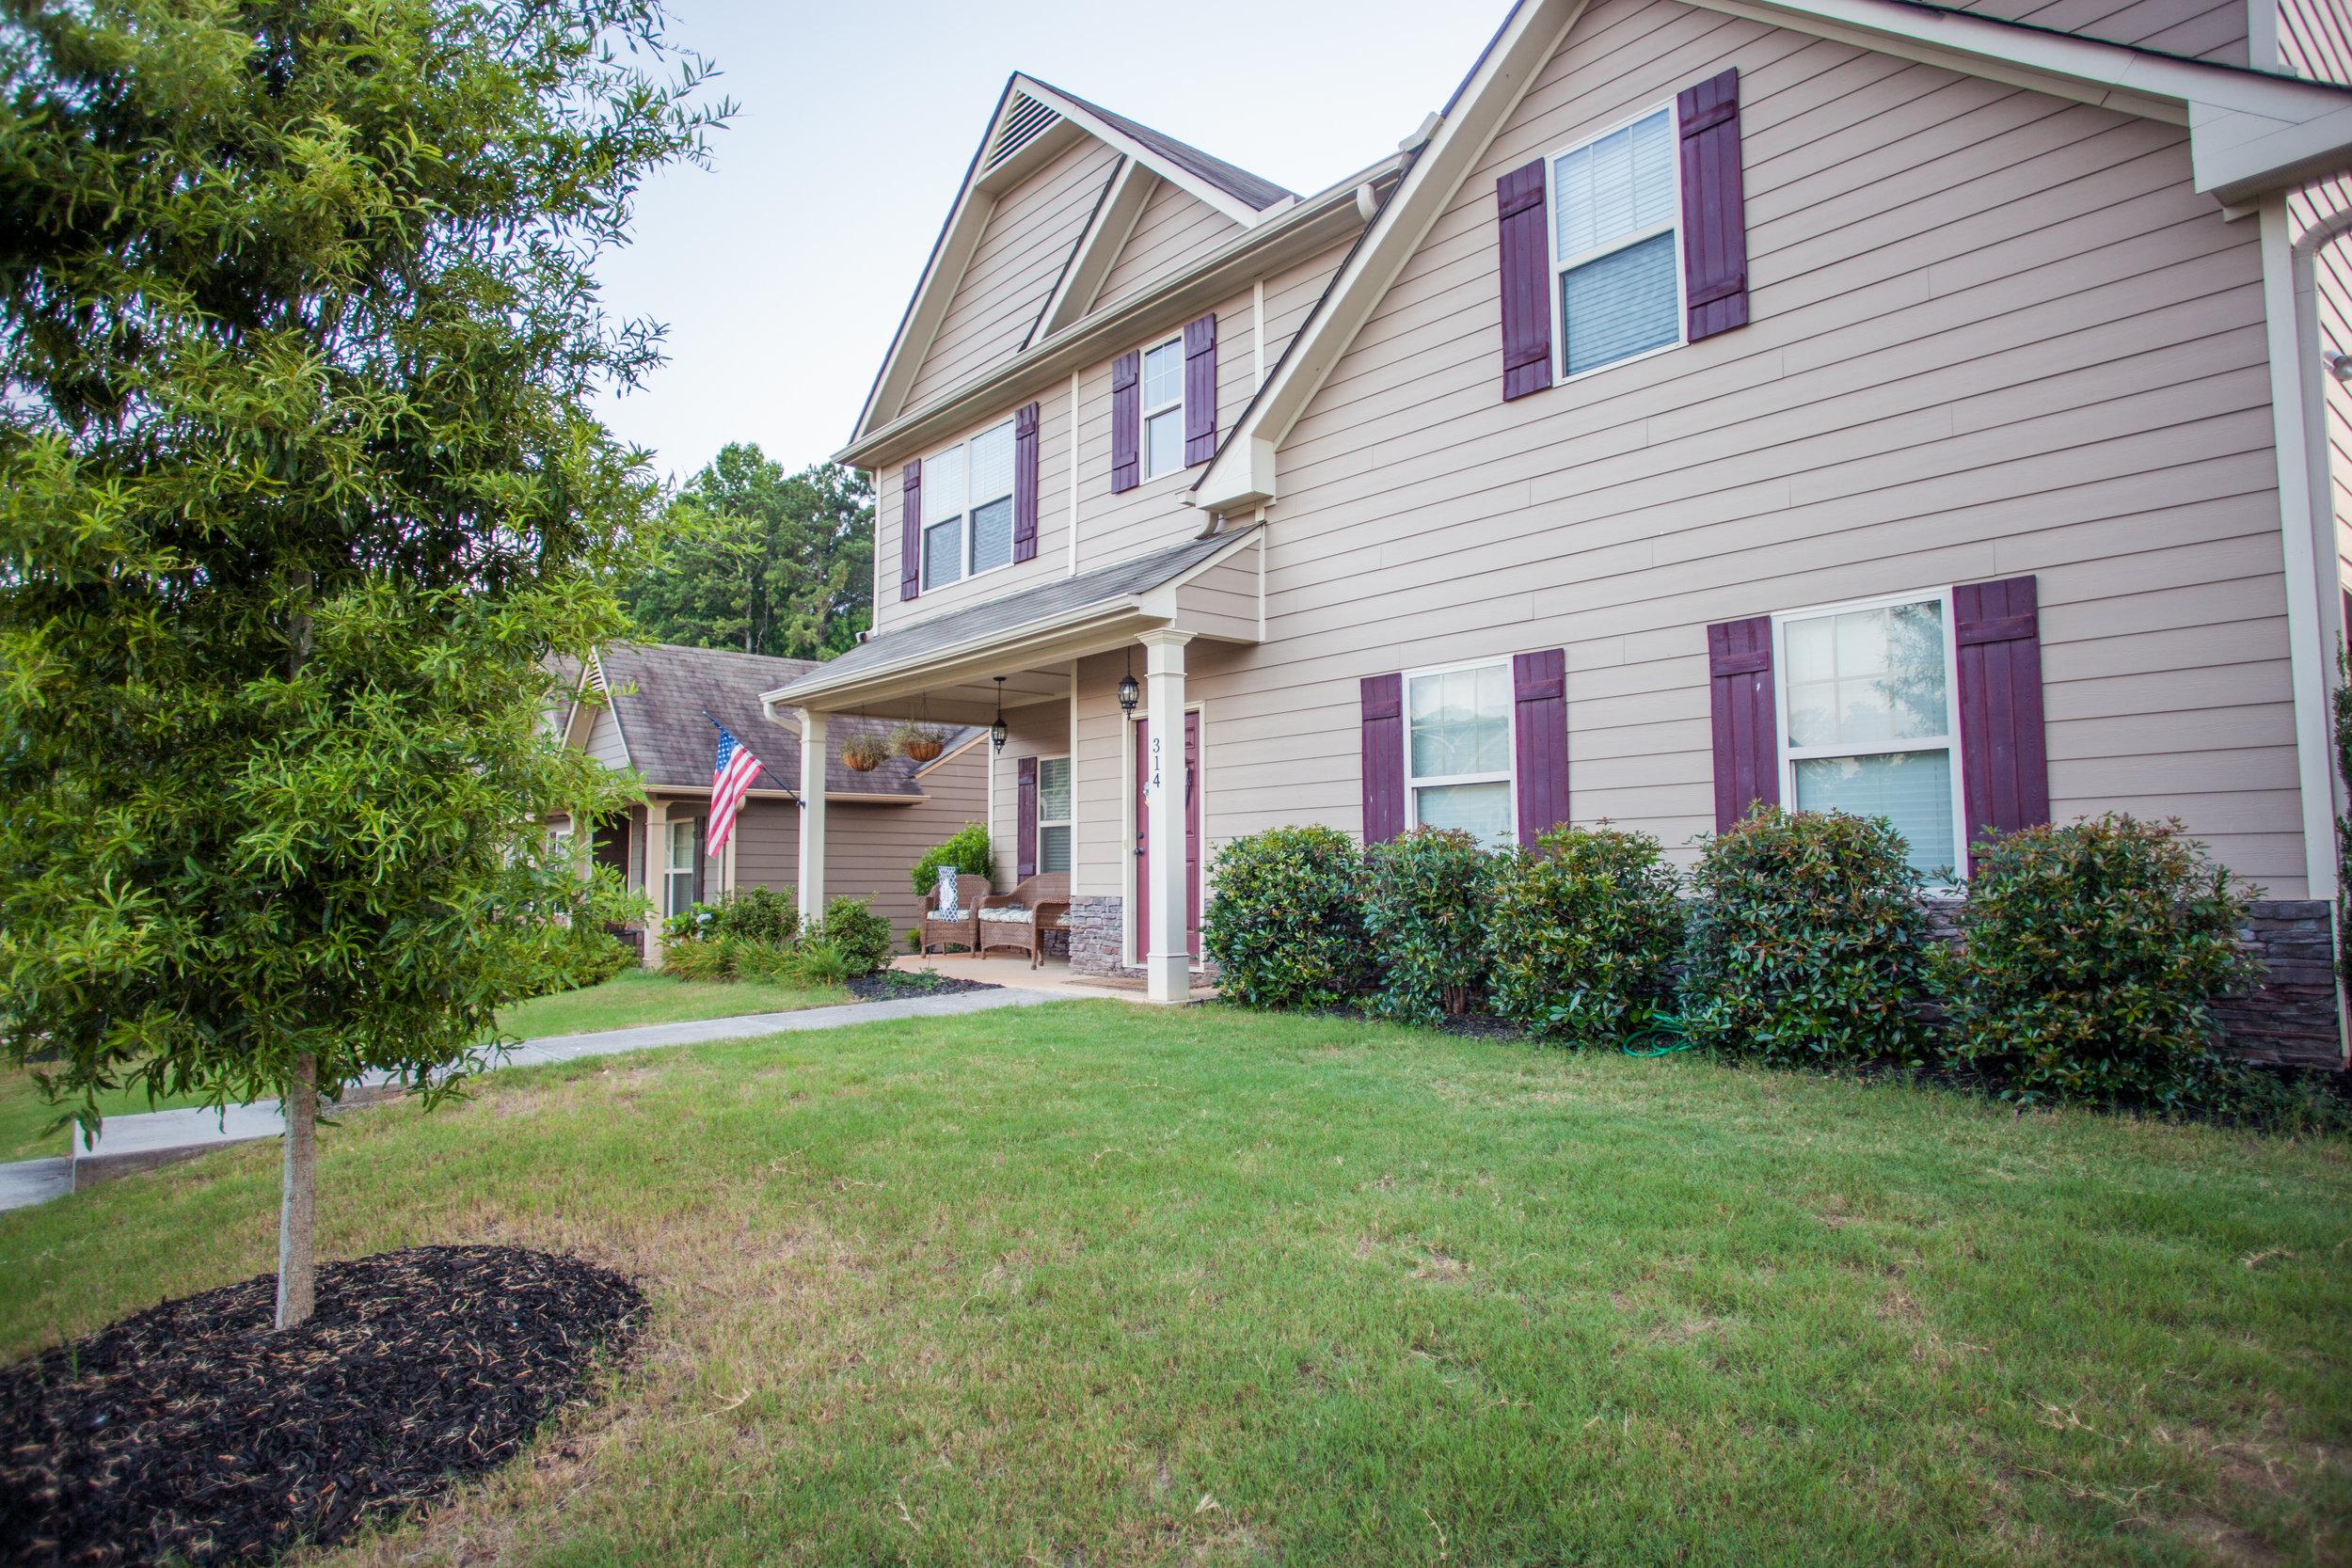 woodstock-ga-house-for-sale-wingard-real-estate-under-300k-65.jpg